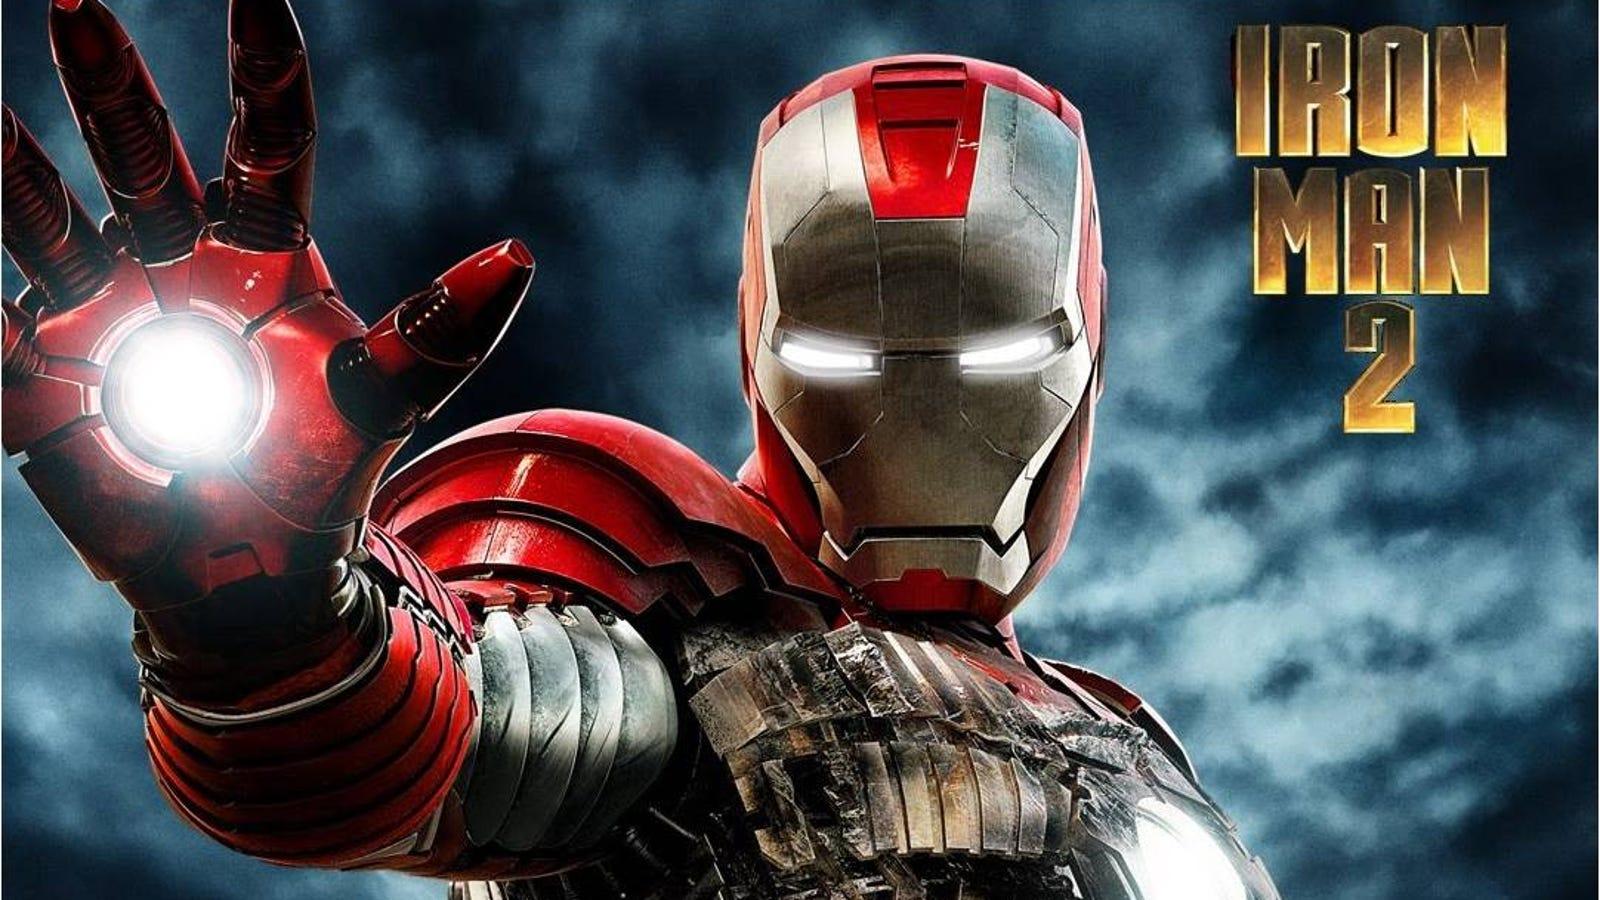 Todos los errores de Iron Man 2 en seis minutos